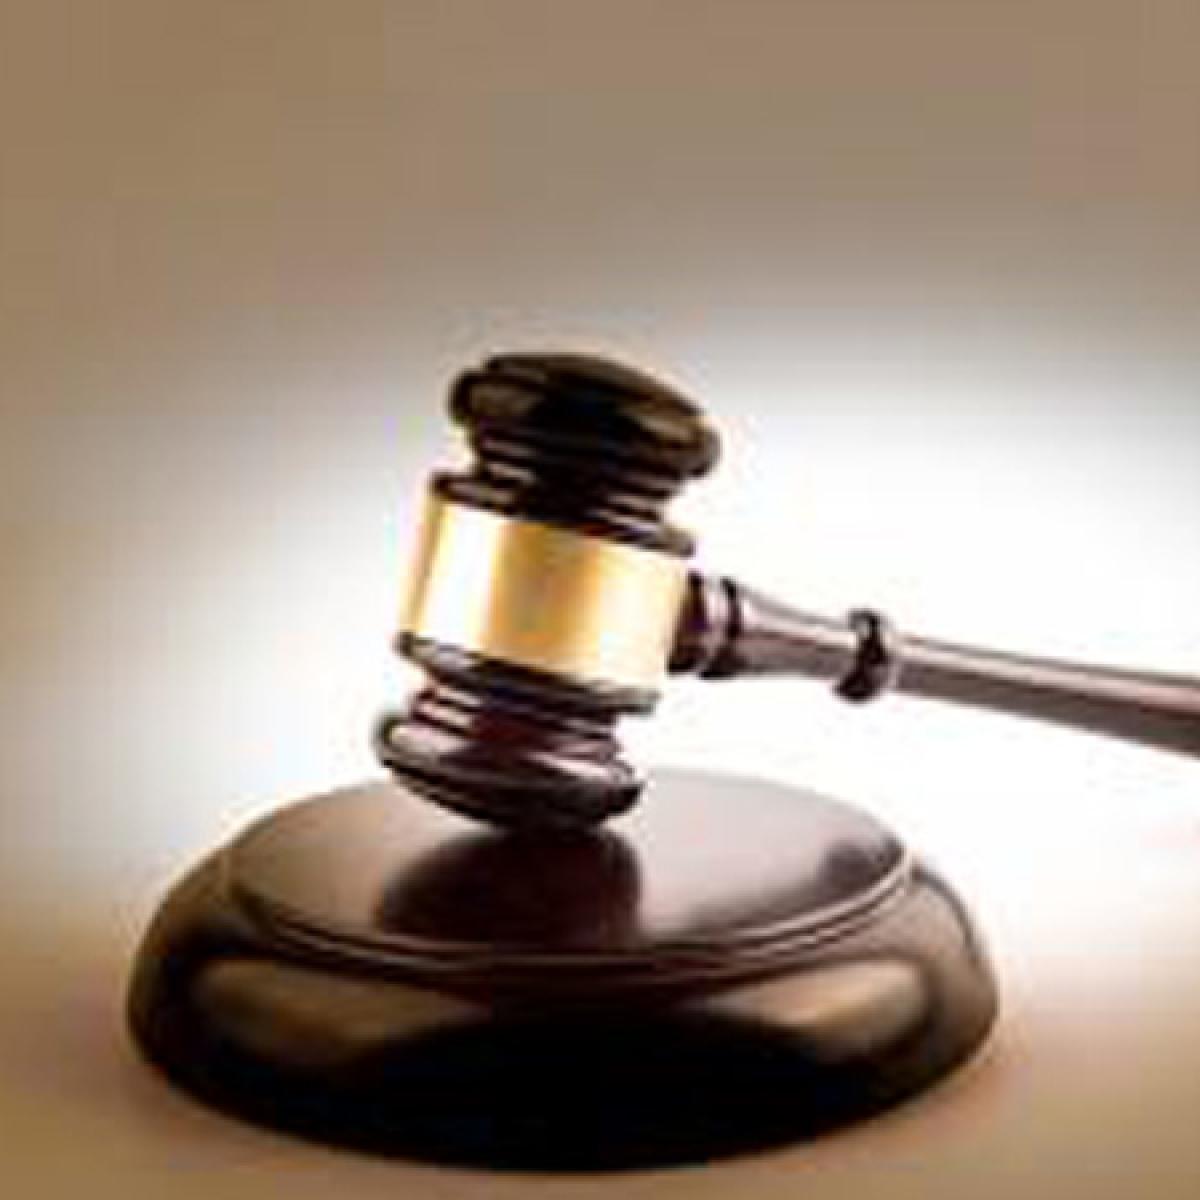 Local court in Mathura admits petition on Krishna 'Janmabhoomi'